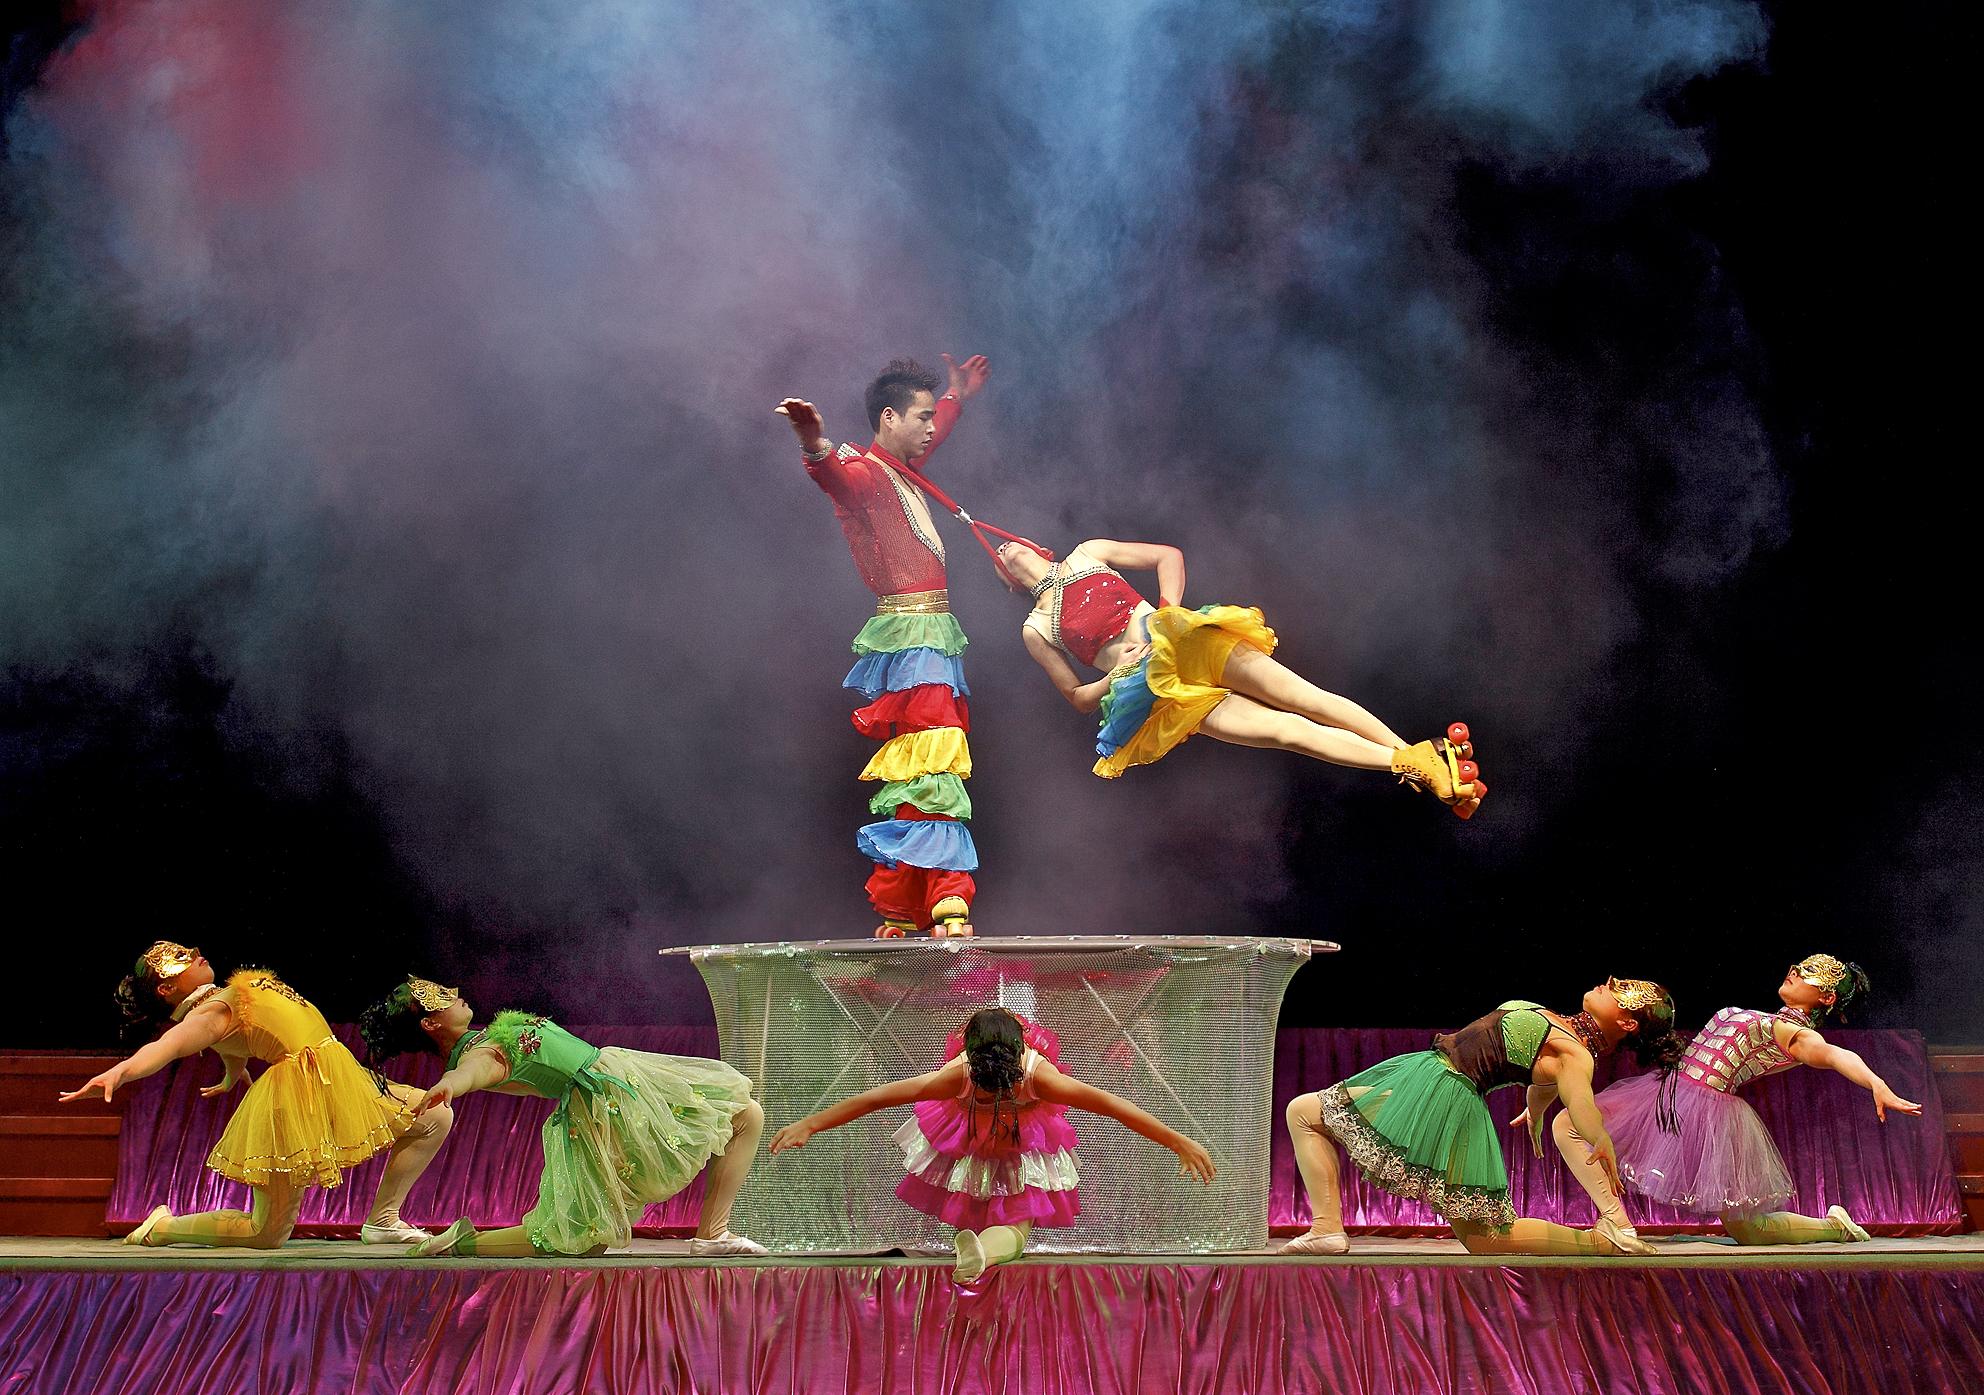 Cirque Shanghai 2010- Rollorskate Pose 1